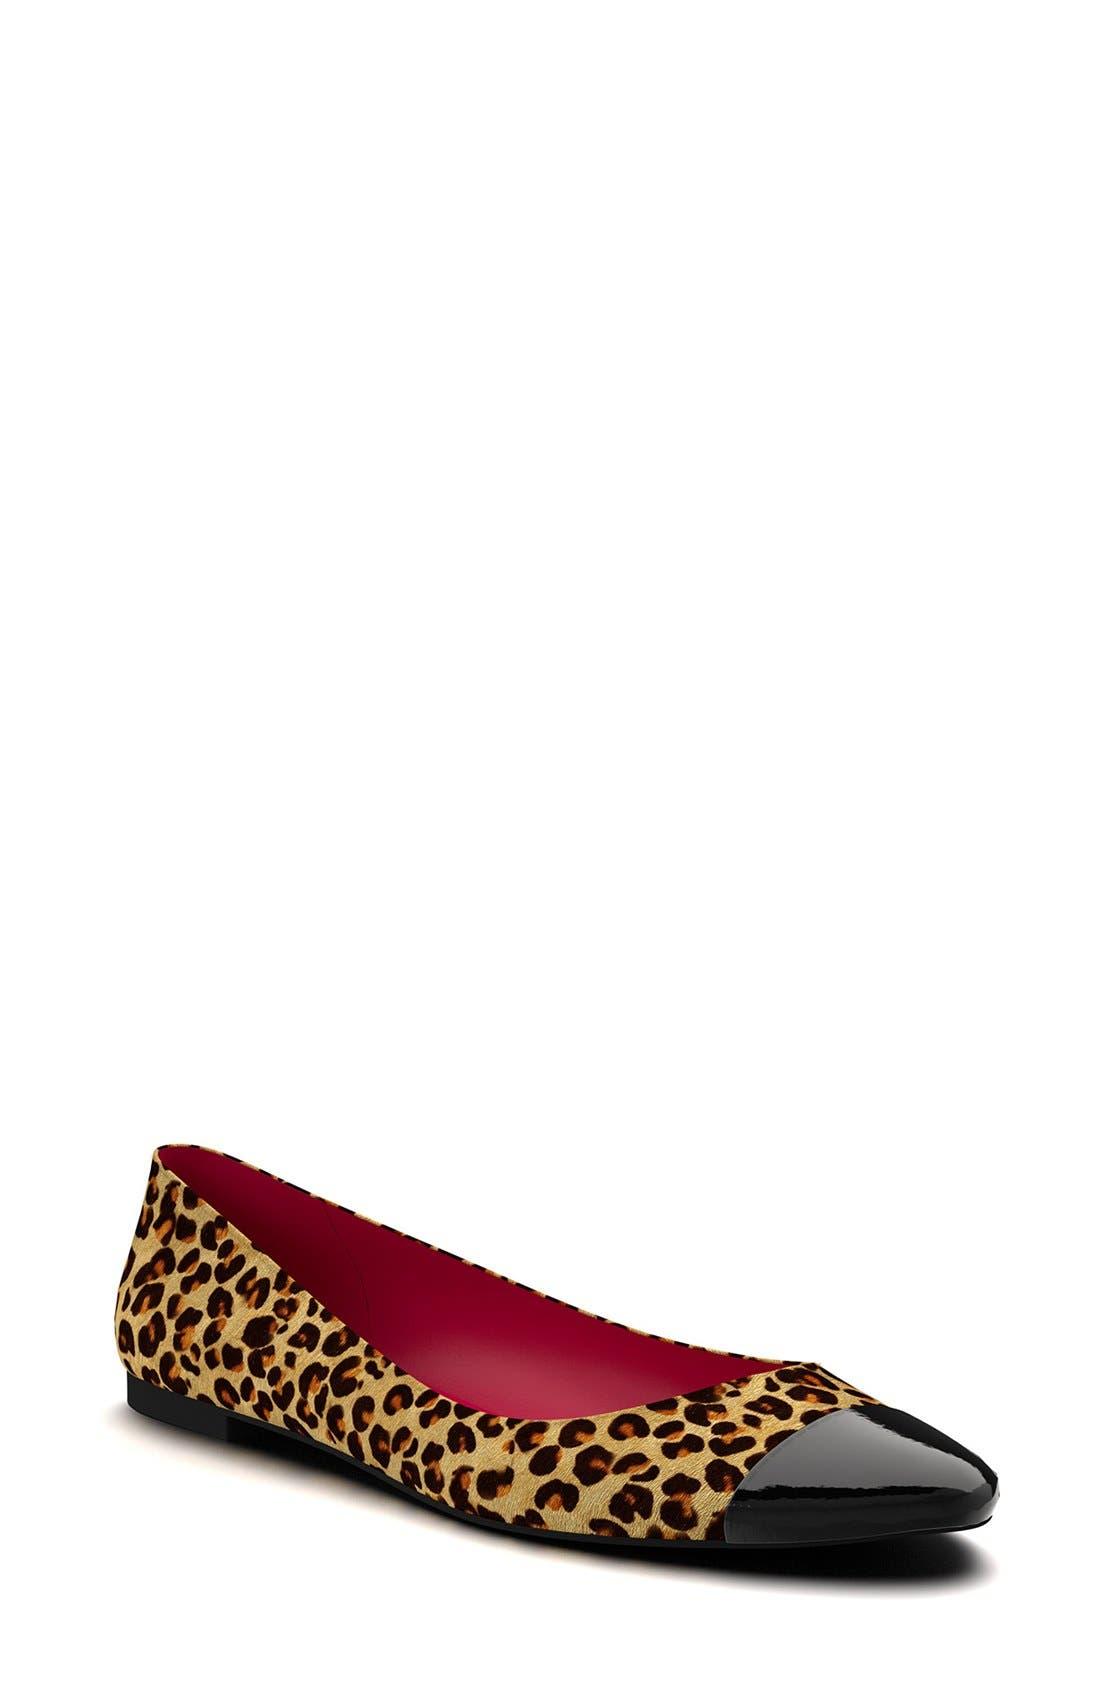 Main Image - Shoes of Prey Leopard Genuine Calf Hair Ballet Flat (Women)